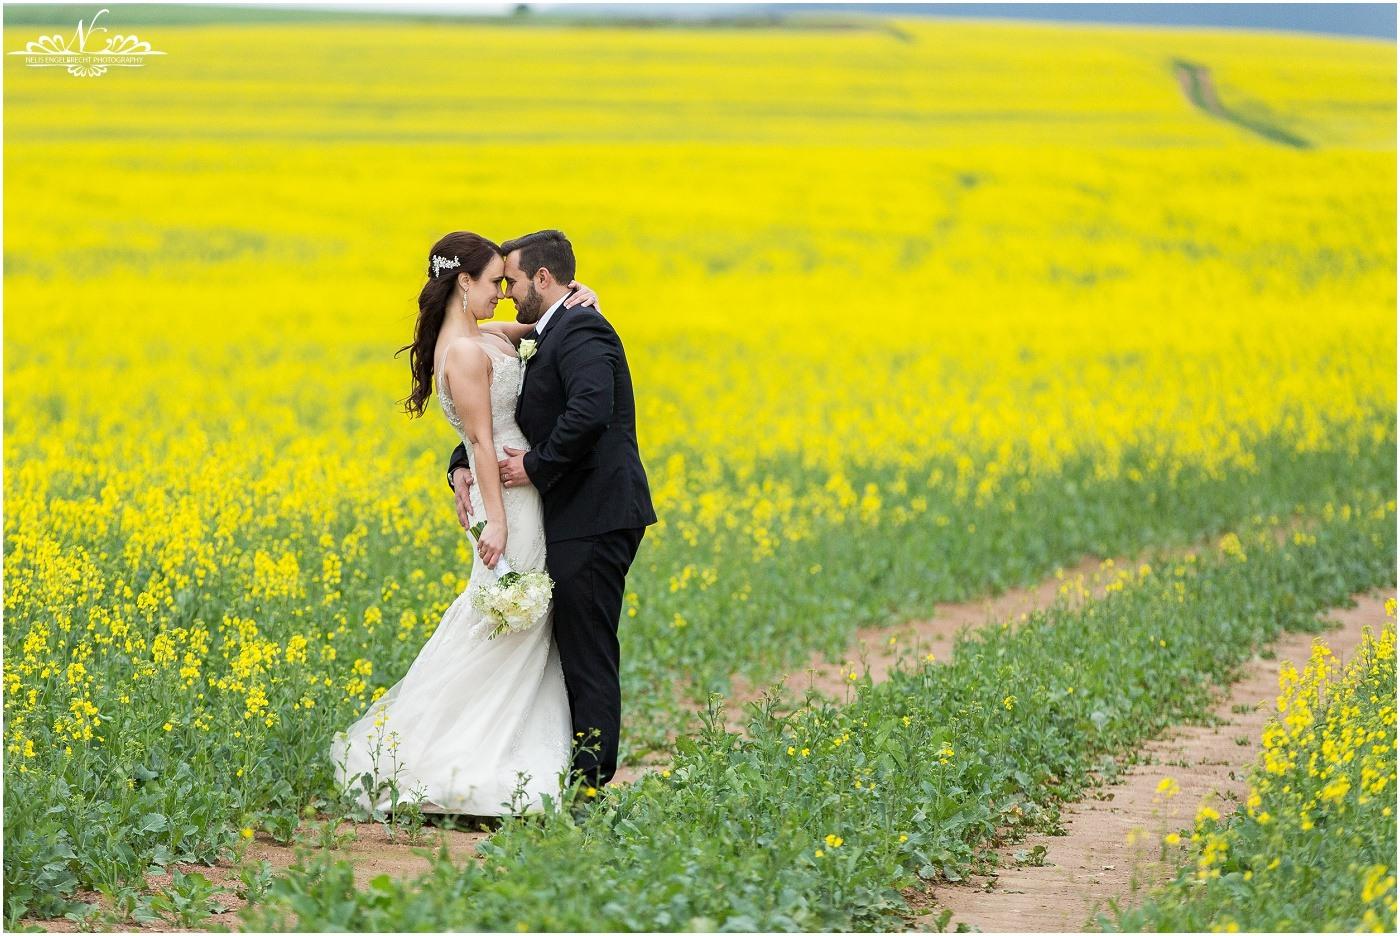 Eensgezind-Wedding-Photos-Nelis-Engelbrecht-Photography-134